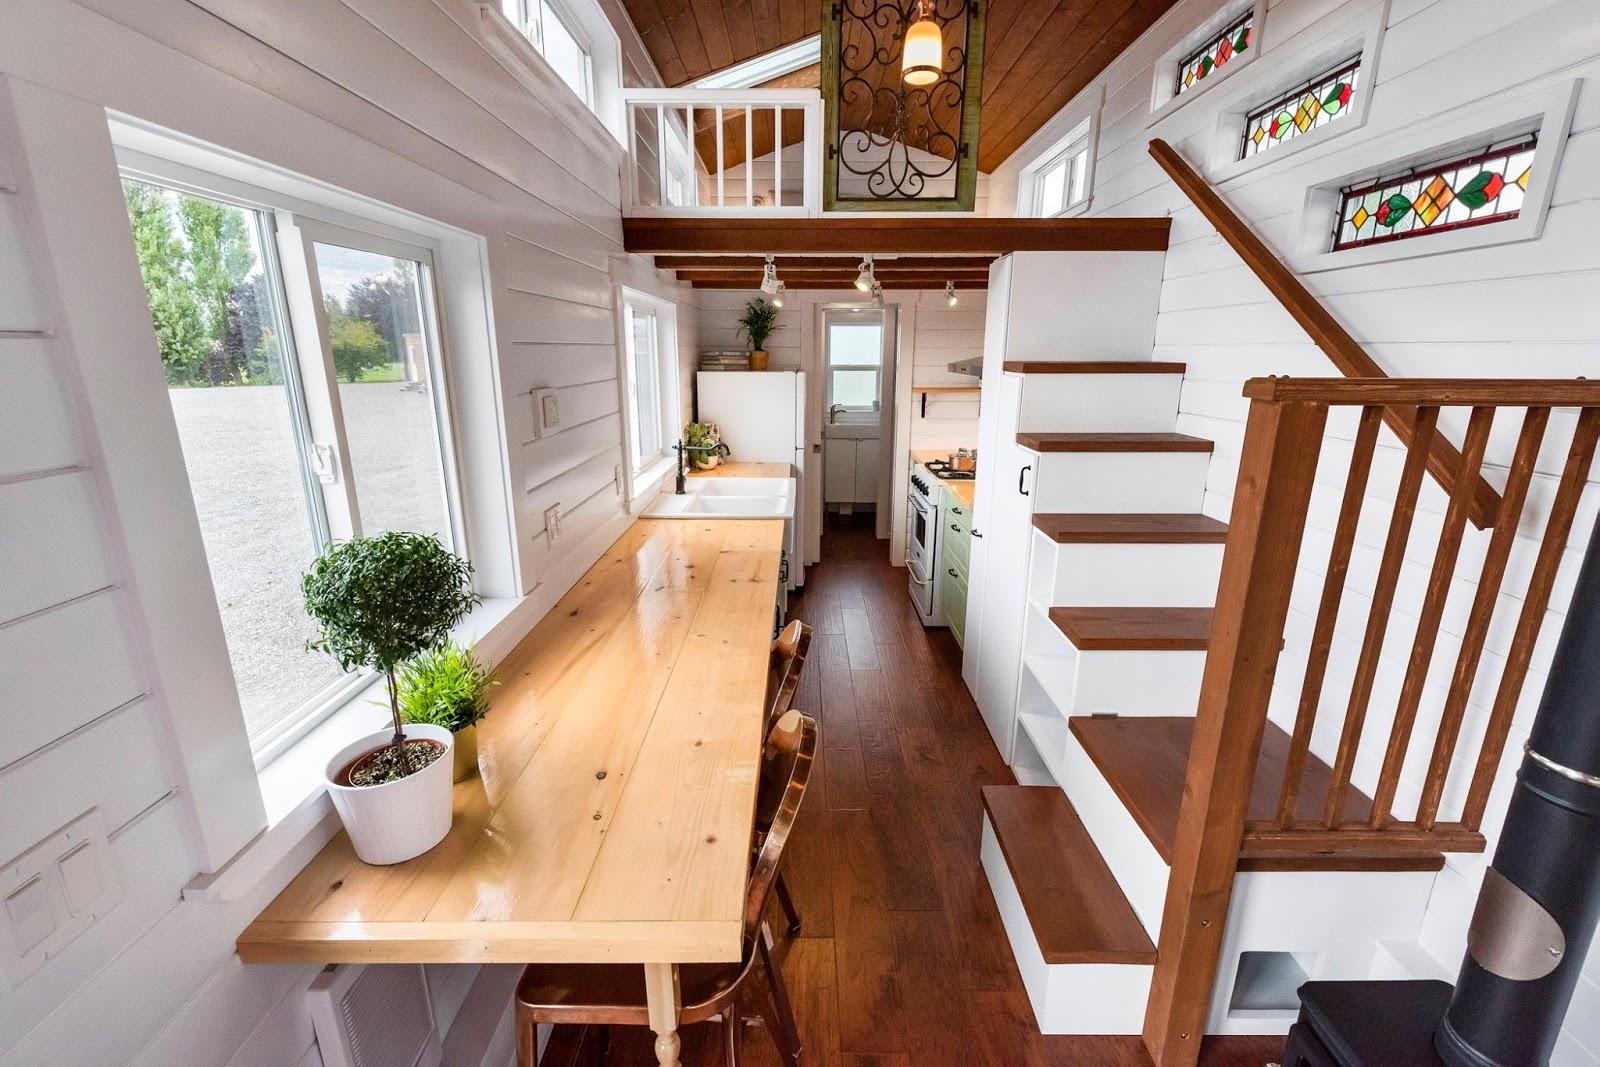 Tiny house town custom 30 39 mint tiny home for House company